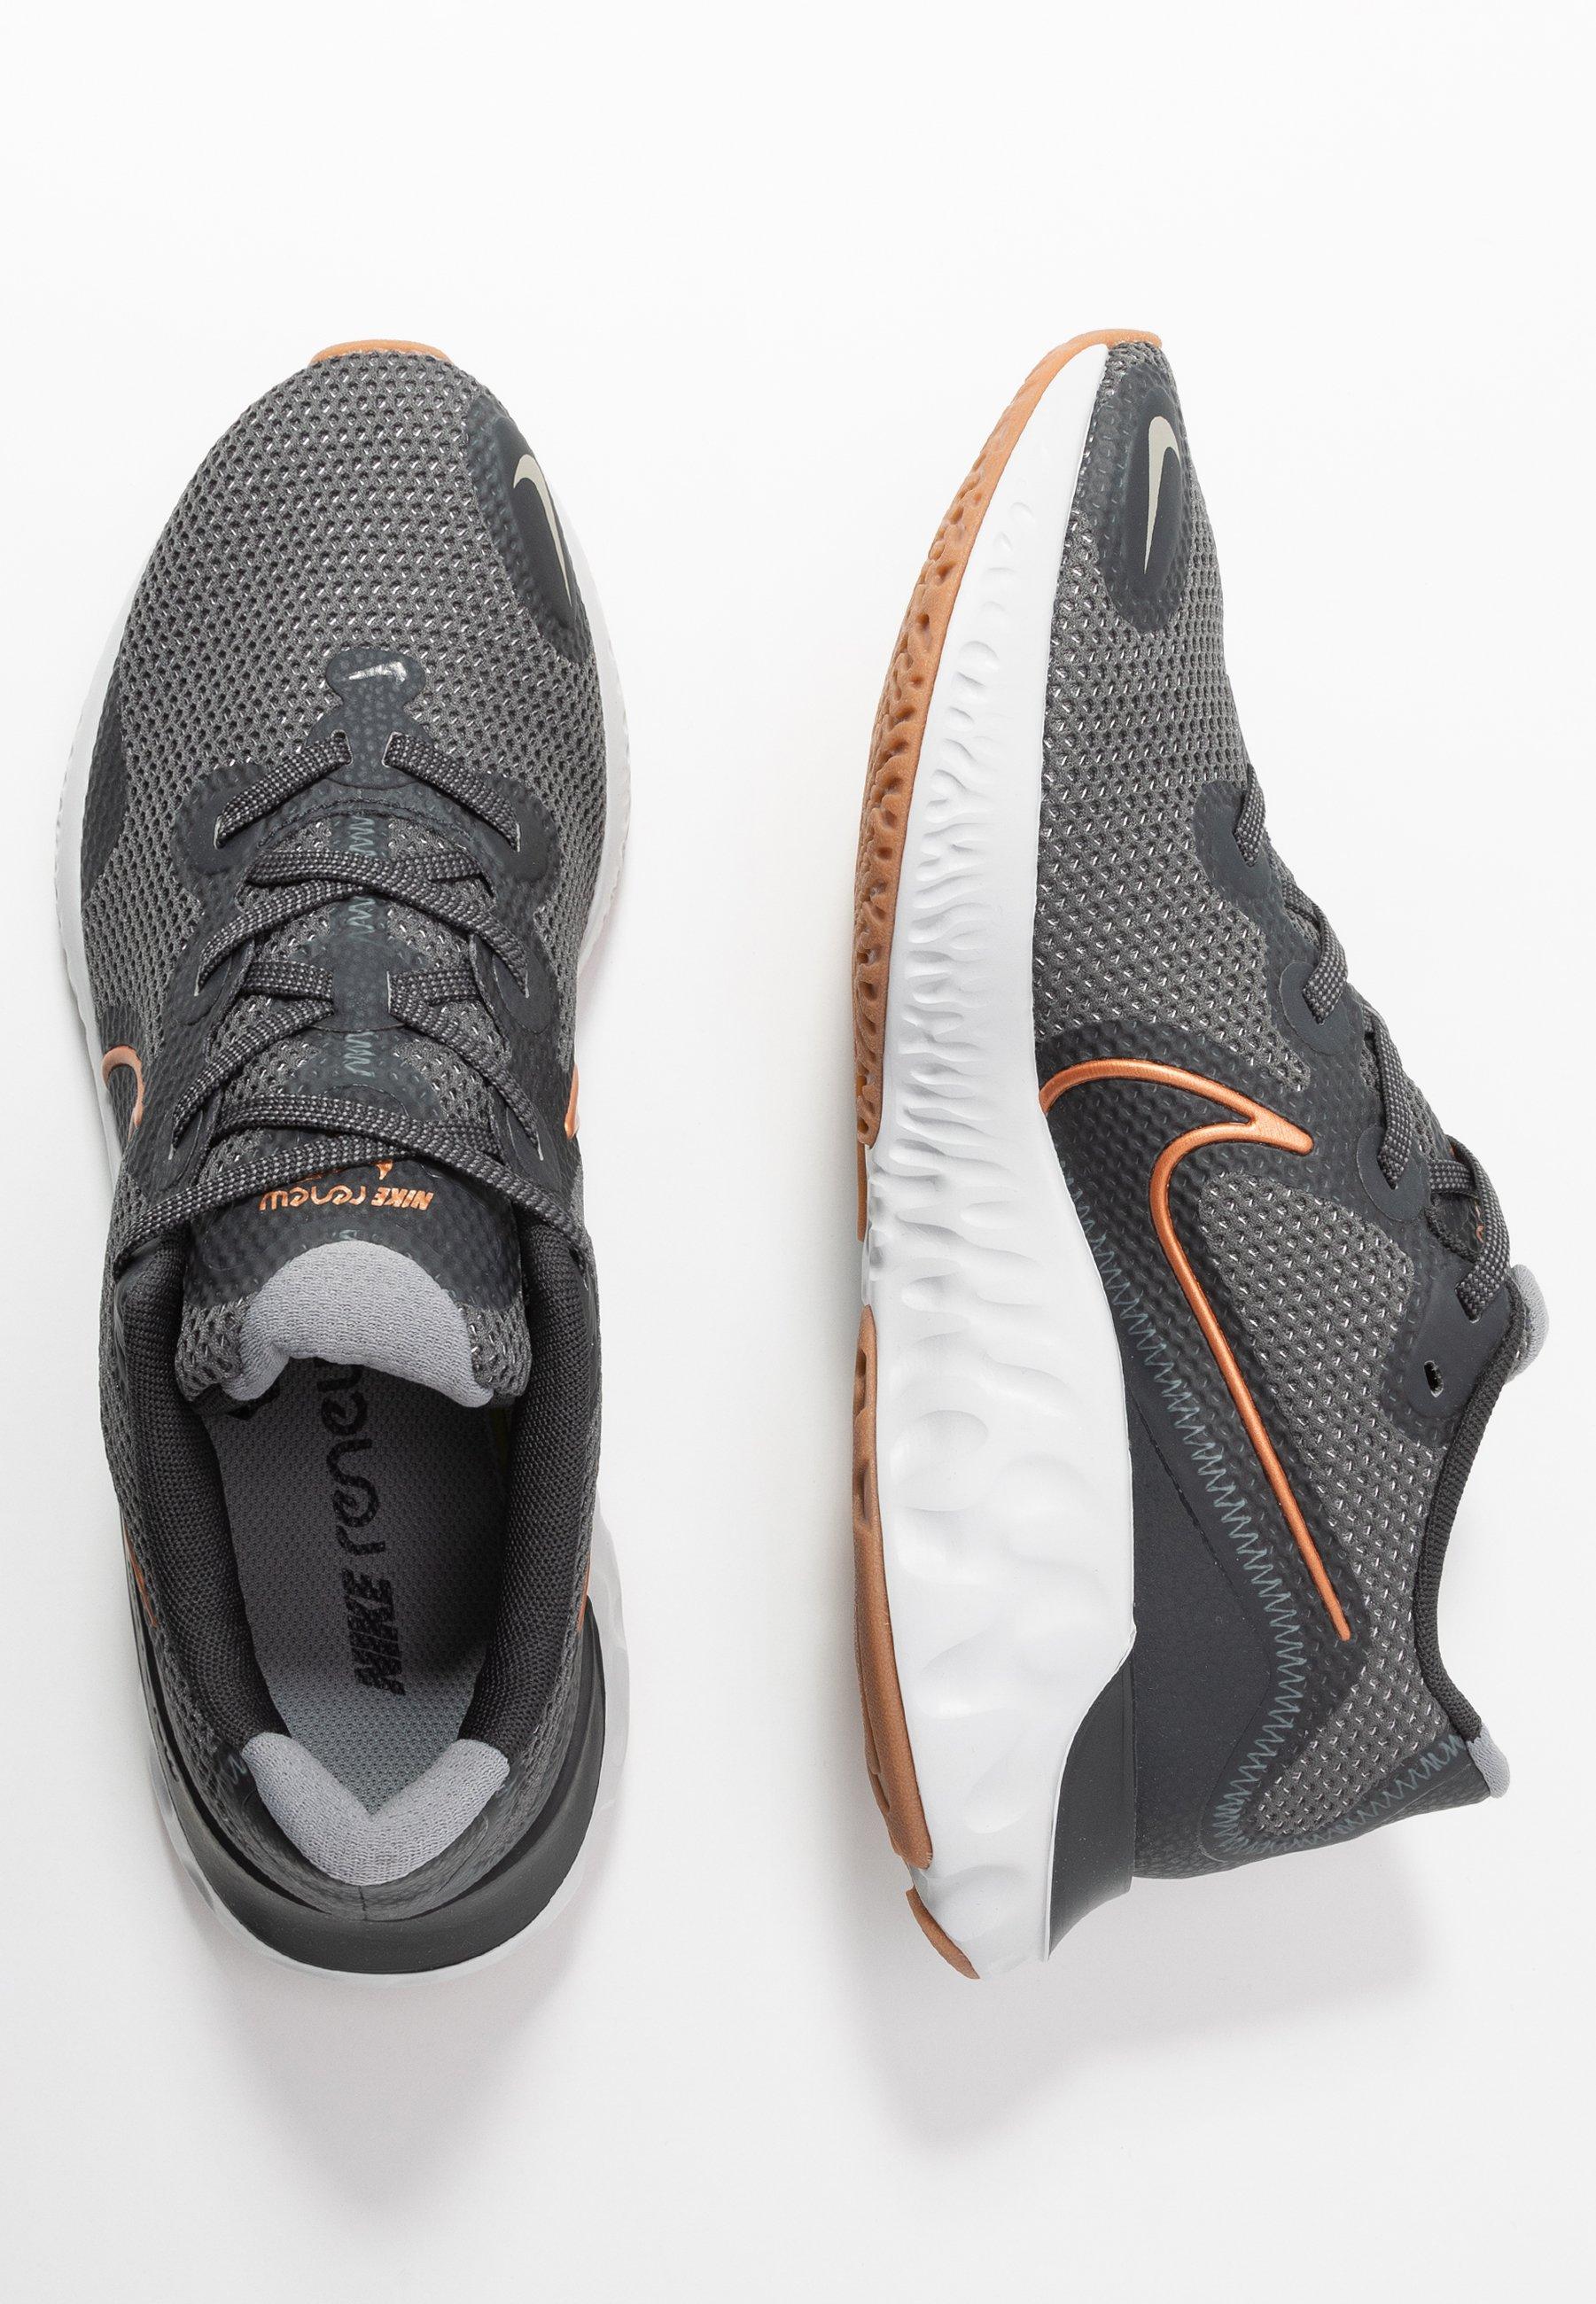 Nike Performance Renew - Hardloopschoenen Neutraal Iron Grey/metallic Copper/dark Smoke Grey/particle Grey/photon Dust/medium Brown Goedkope Schoenen